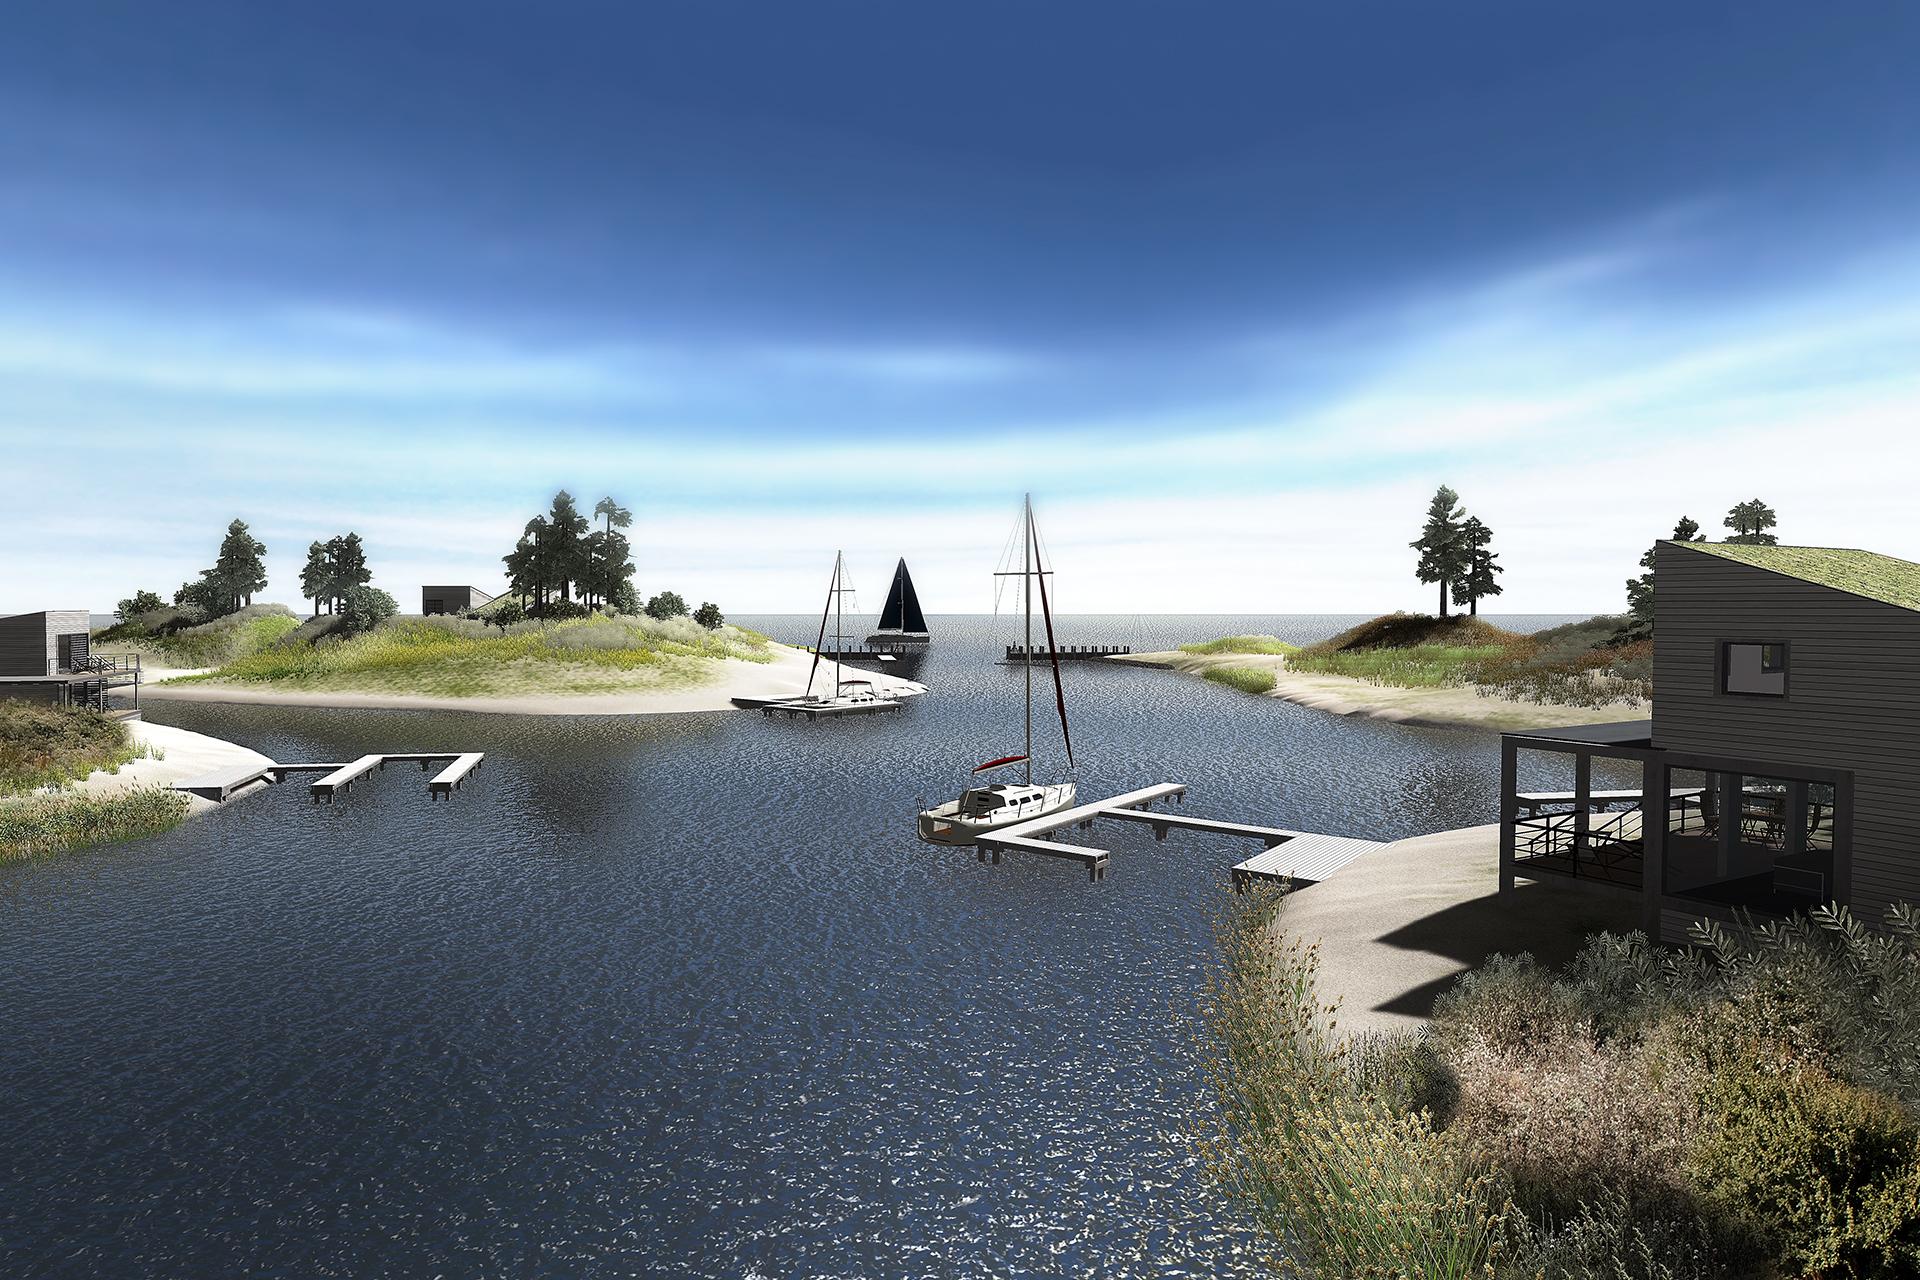 Brouwerseiland (Brouwersdam) - architectuur